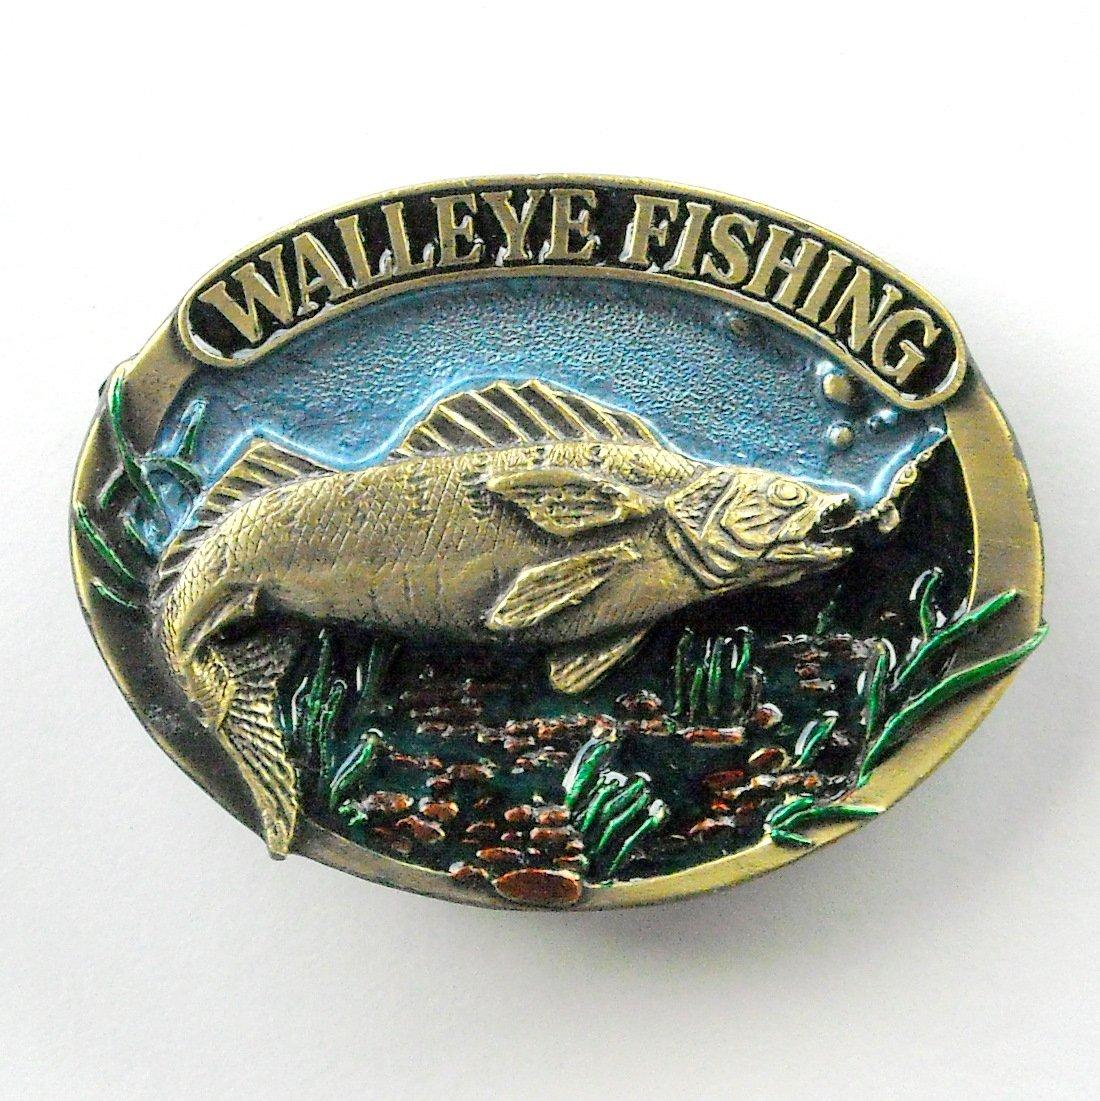 Walleye Fishing Vintage 3D Great American Buckle Pewter metal alloy belt buckle